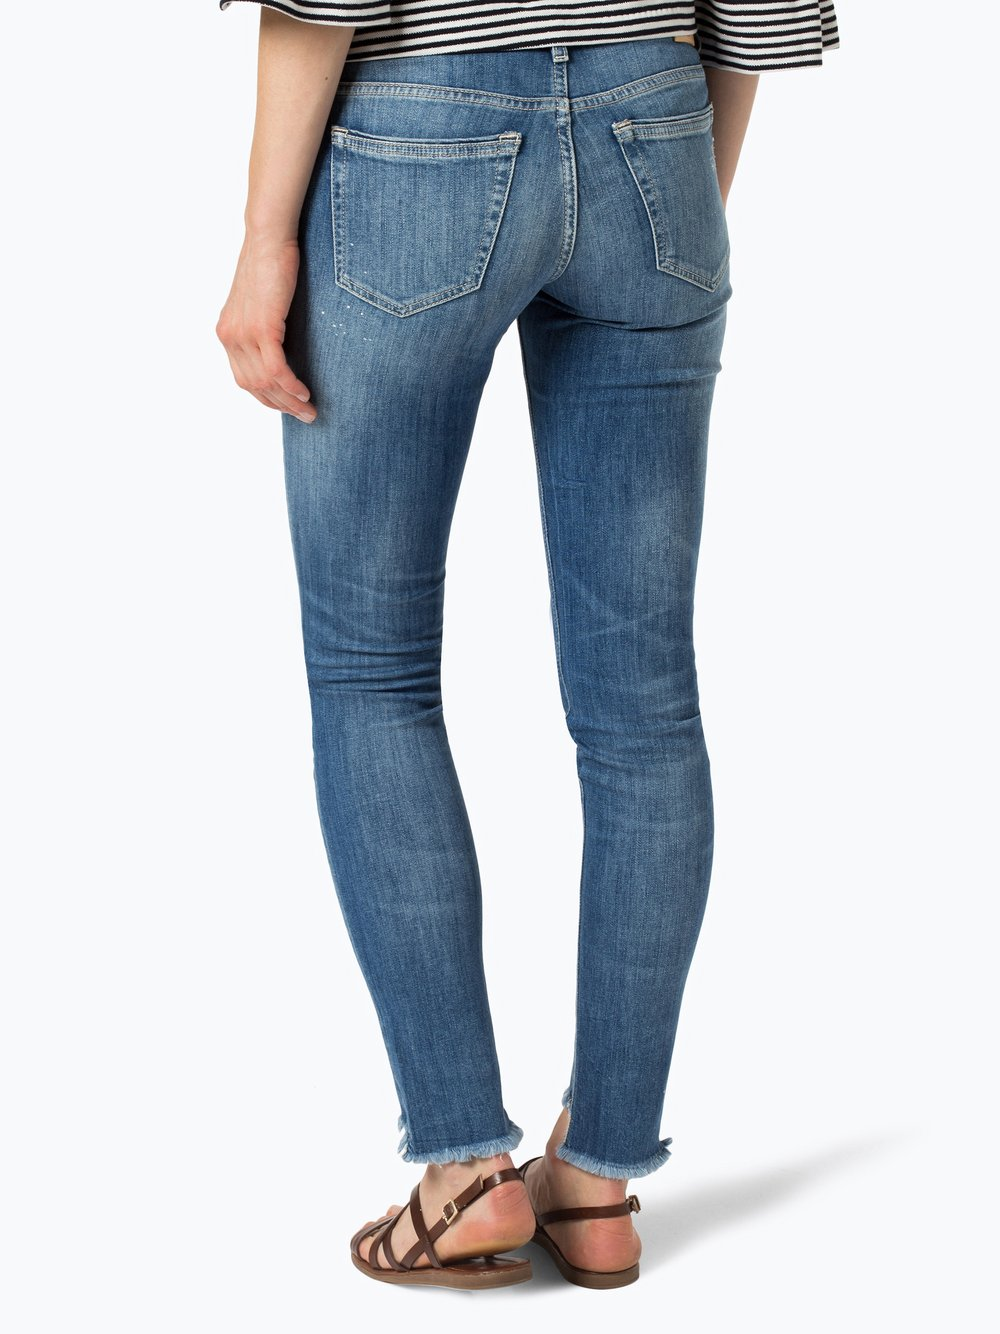 Marc O'Polo Damen Jeans Lulea online kaufen | PEEK UND